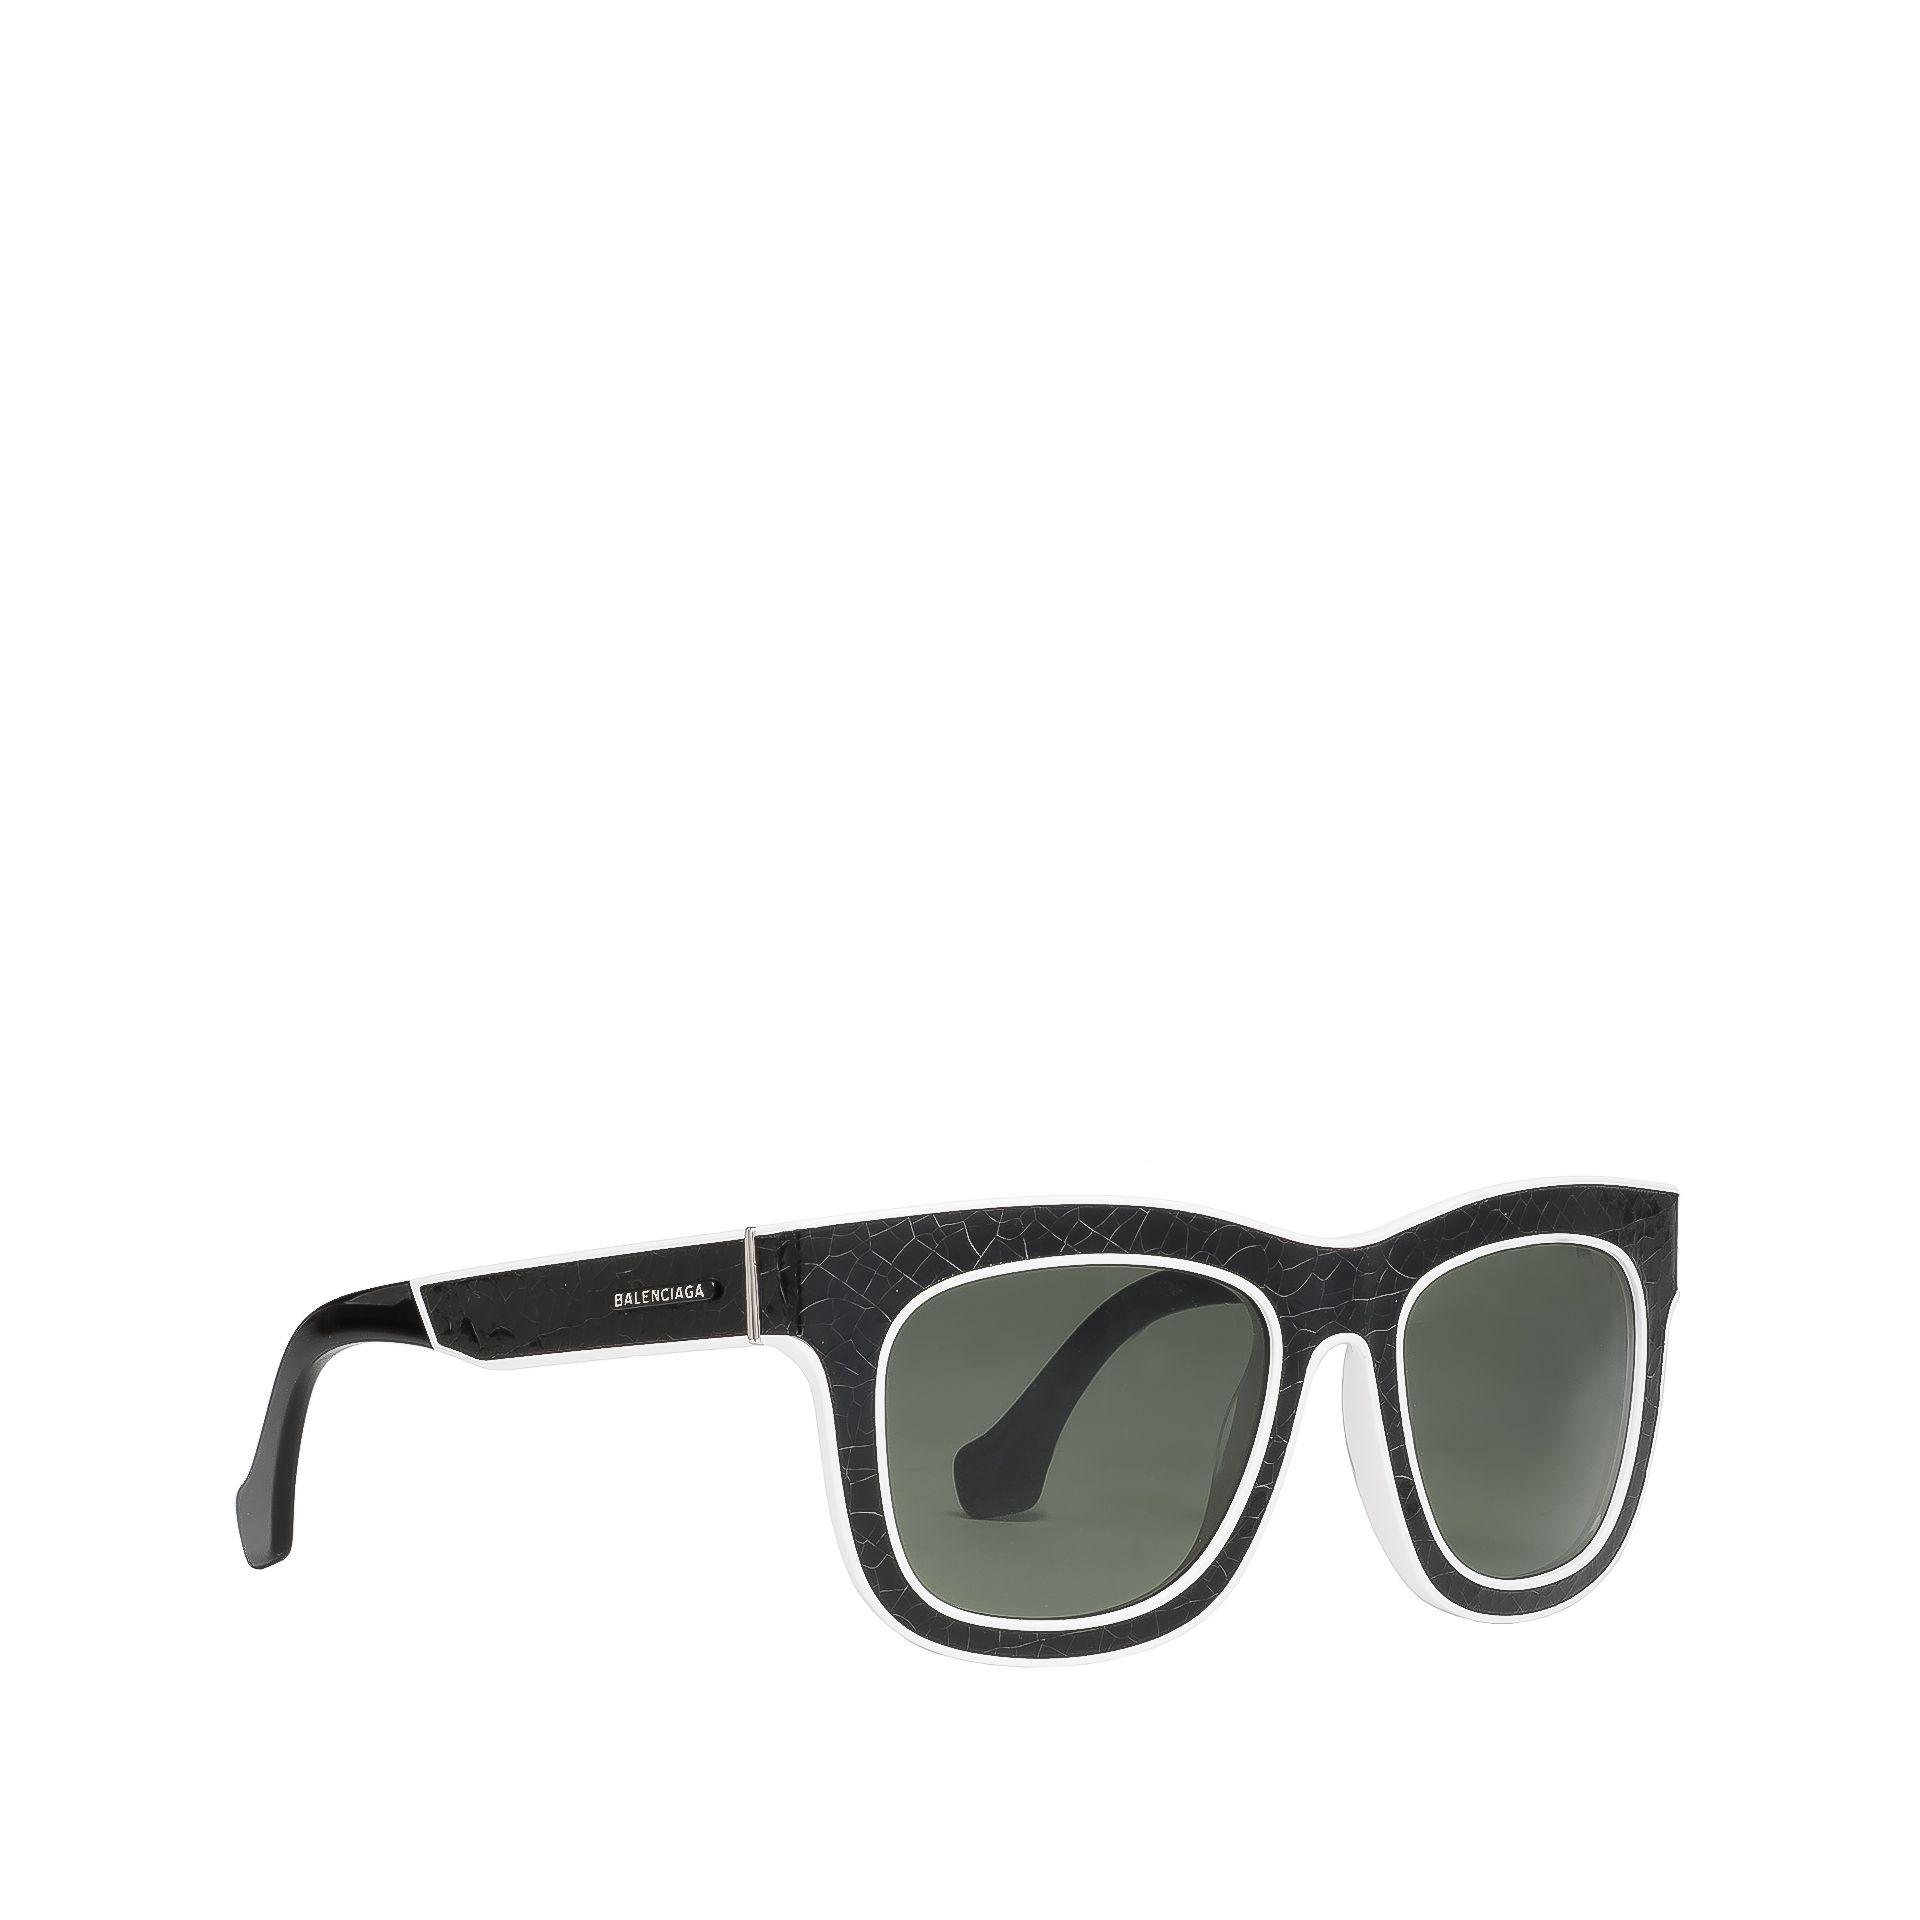 BALENCIAGA Balenciaga Marble Sunglasses Sunglasses D f